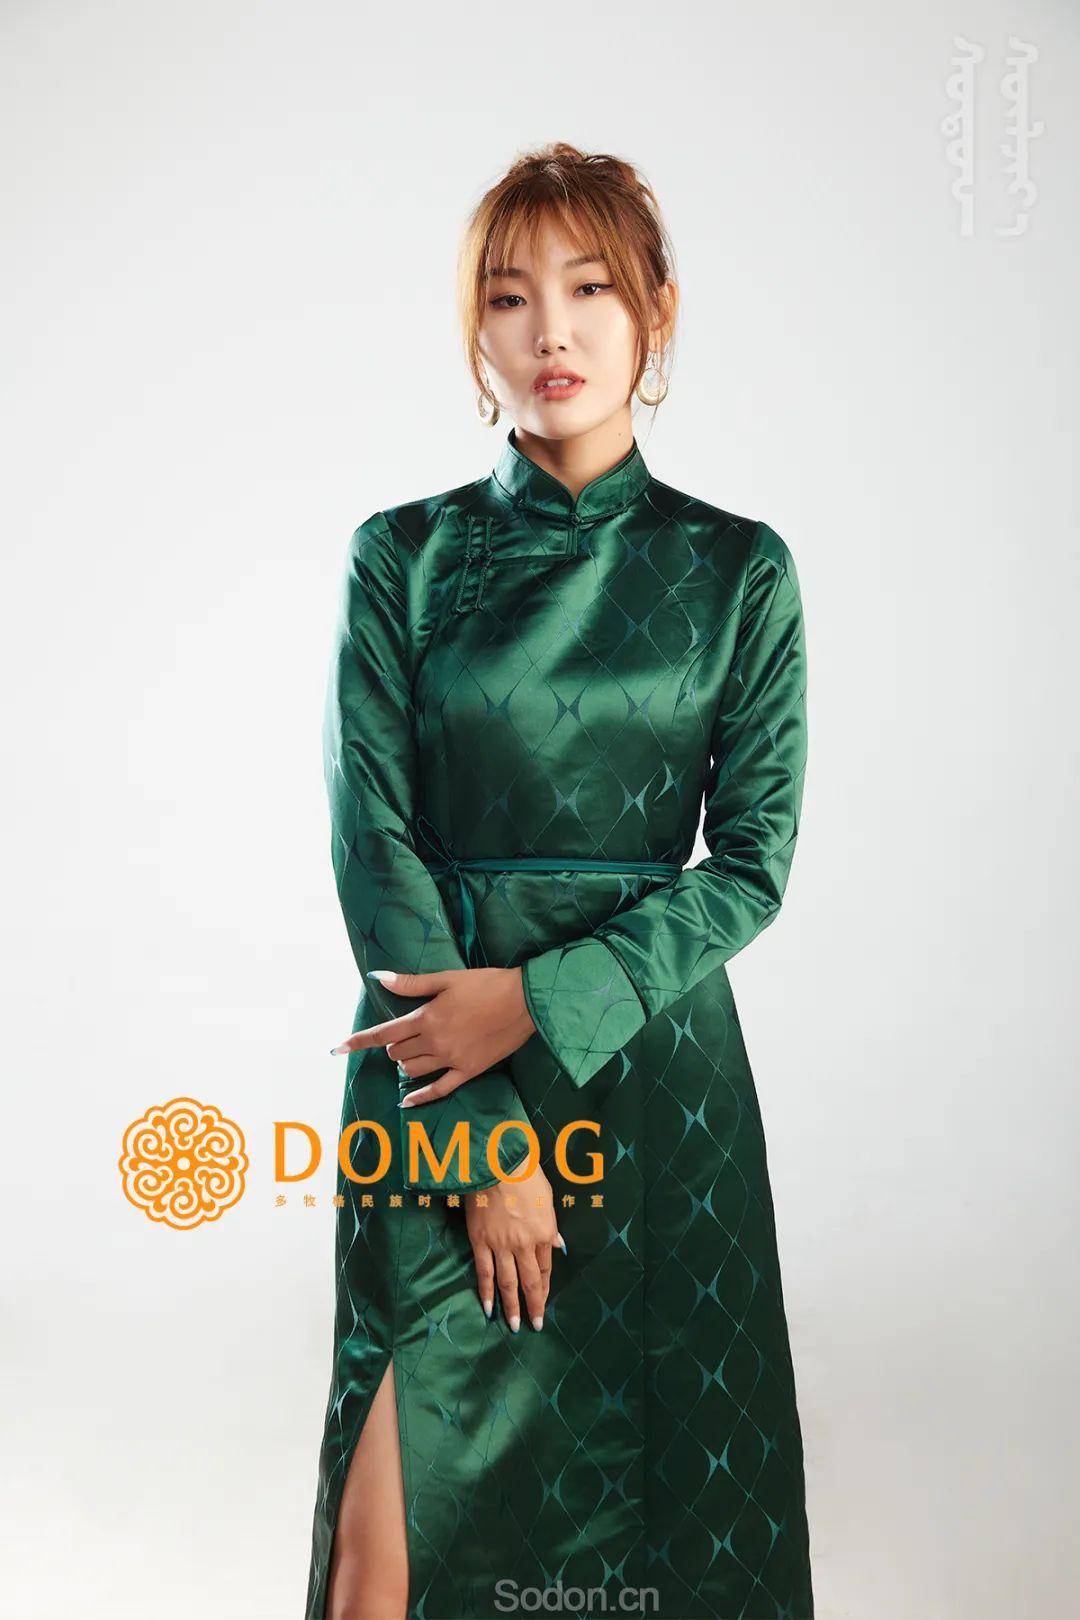 DOMOG 蒙古时装2020新款,民族与时尚的融合 第16张 DOMOG 蒙古时装2020新款,民族与时尚的融合 蒙古服饰